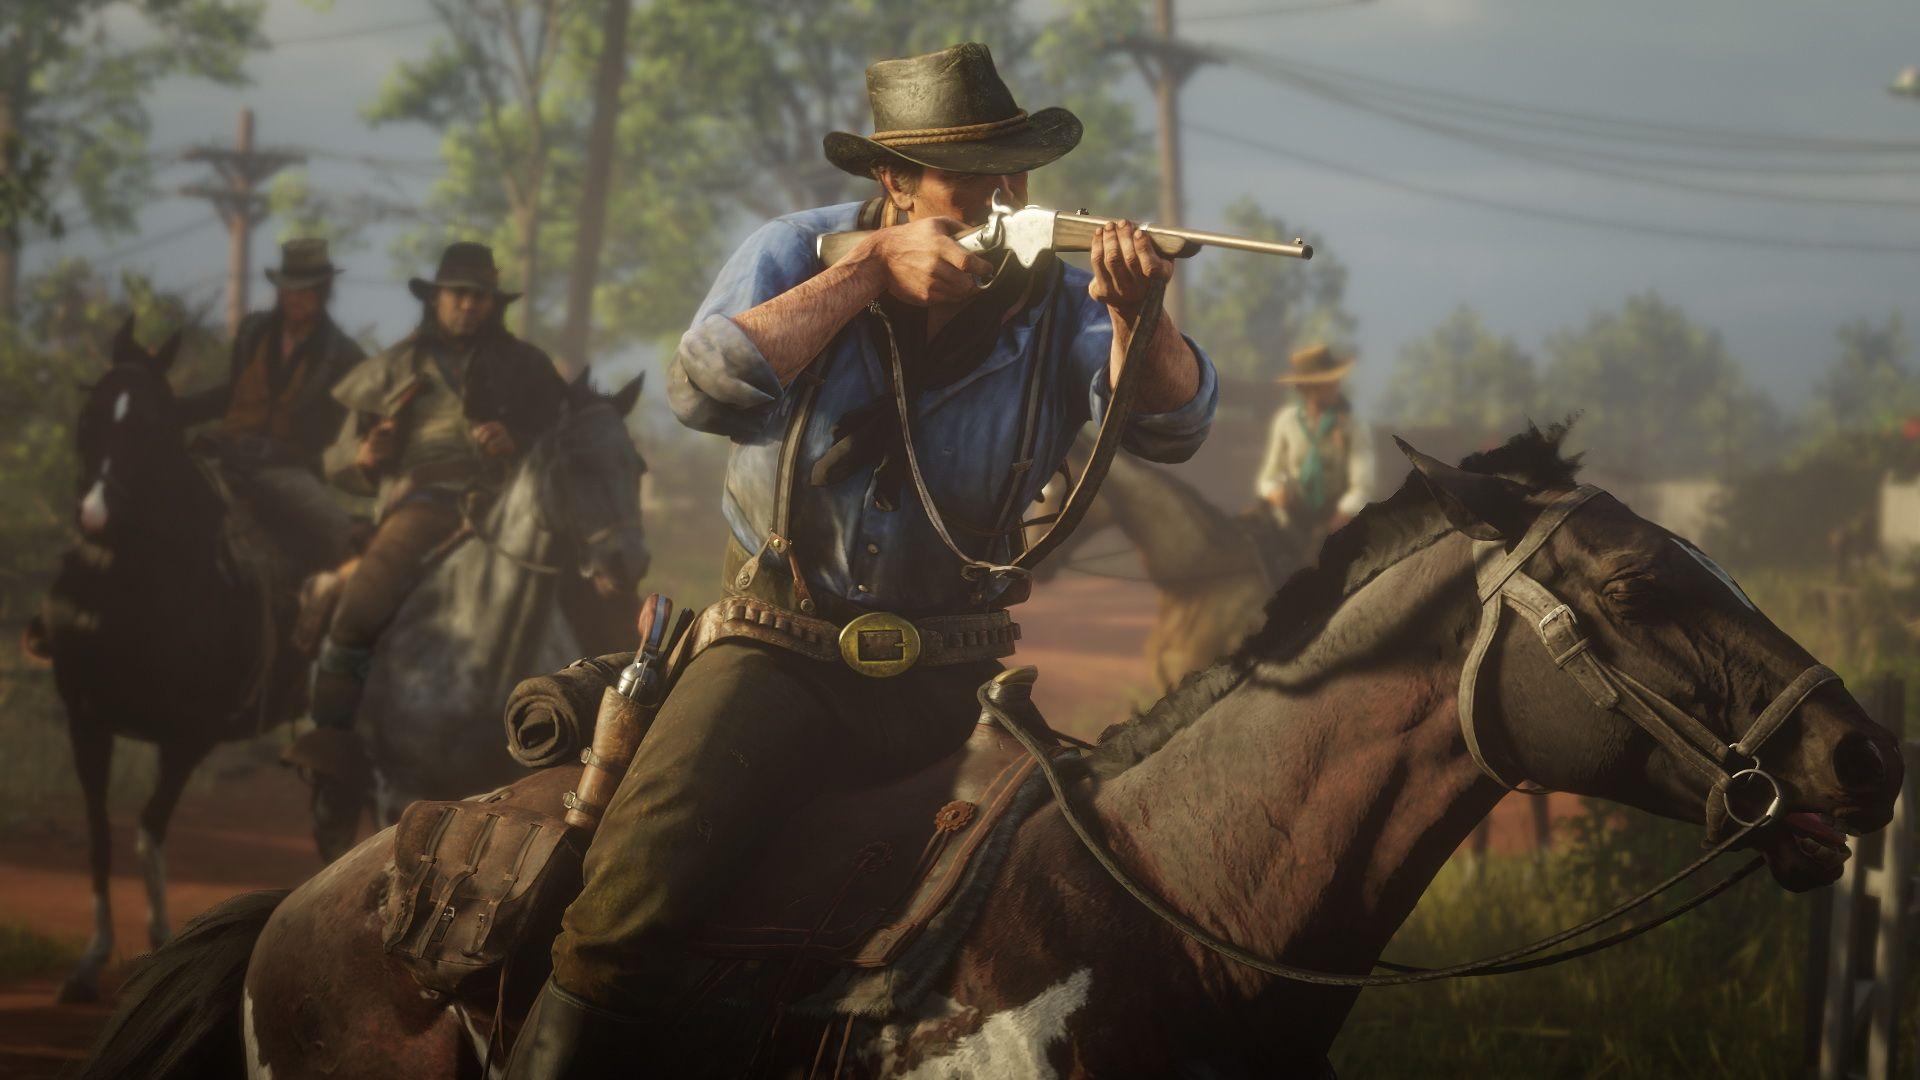 First Look Previews Of Red Dead Redemption 2 Rockstar Games Videojuegos Personajes De Videojuegos Red Dead Redemption